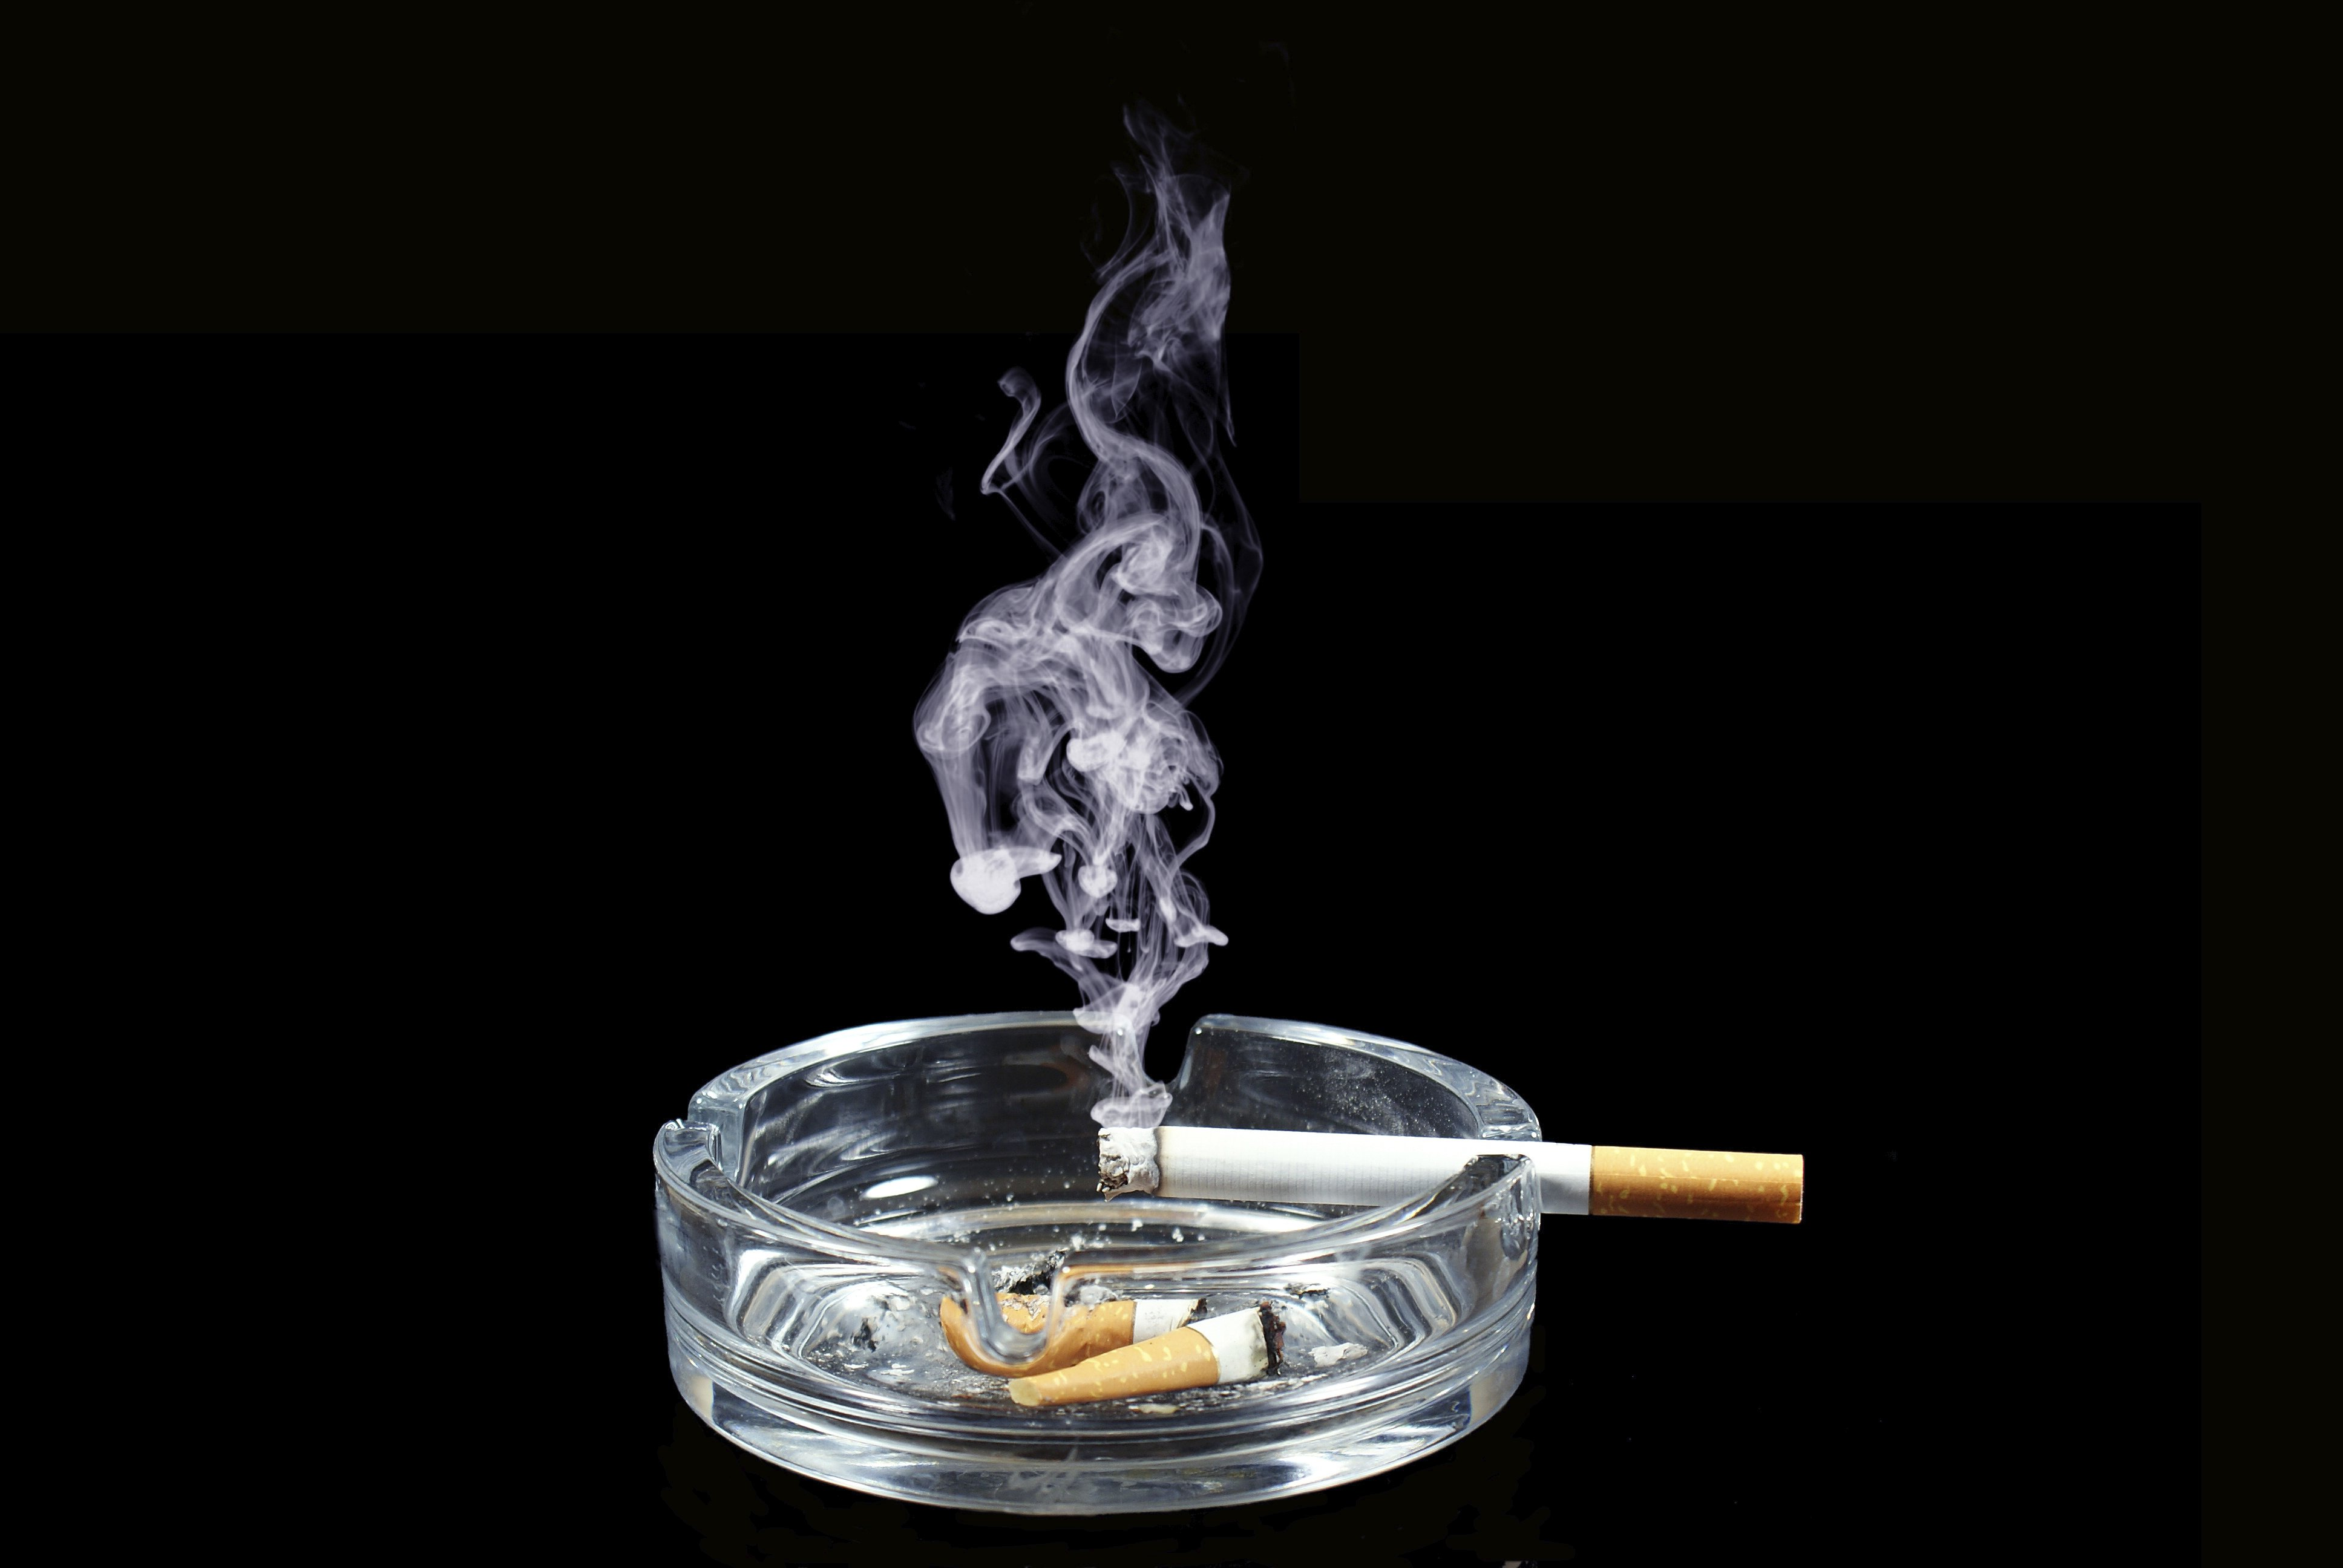 Marlboro Cigarette Wallpaper Hd Smoking Cigarettes Wallpaper Images